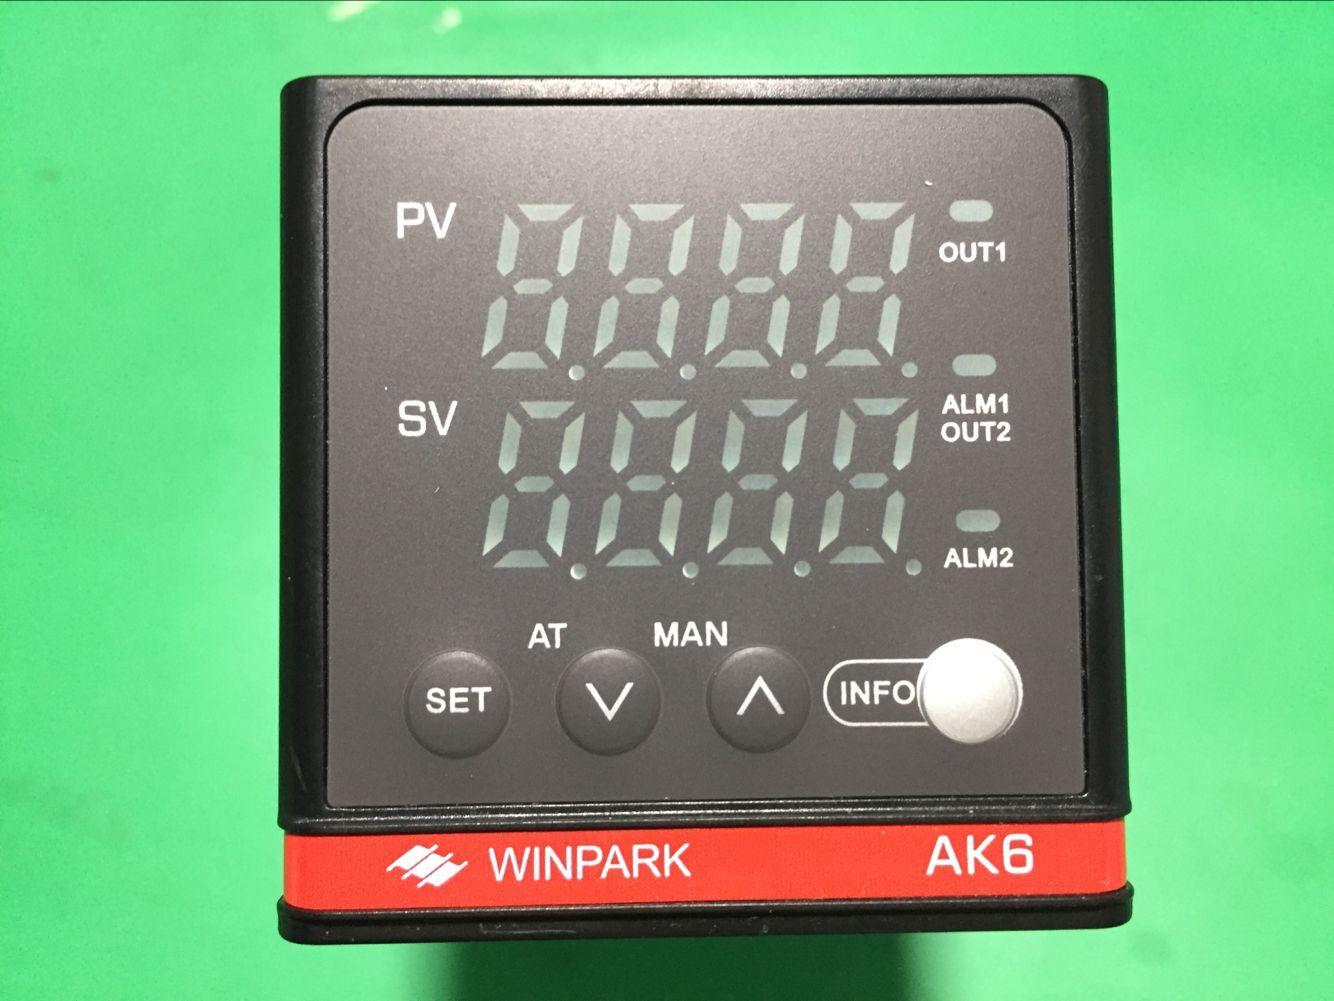 WINPARK التحكم في درجة الحرارة متر AK6-AKL110 APL110 AKL400 AKS110 AK6